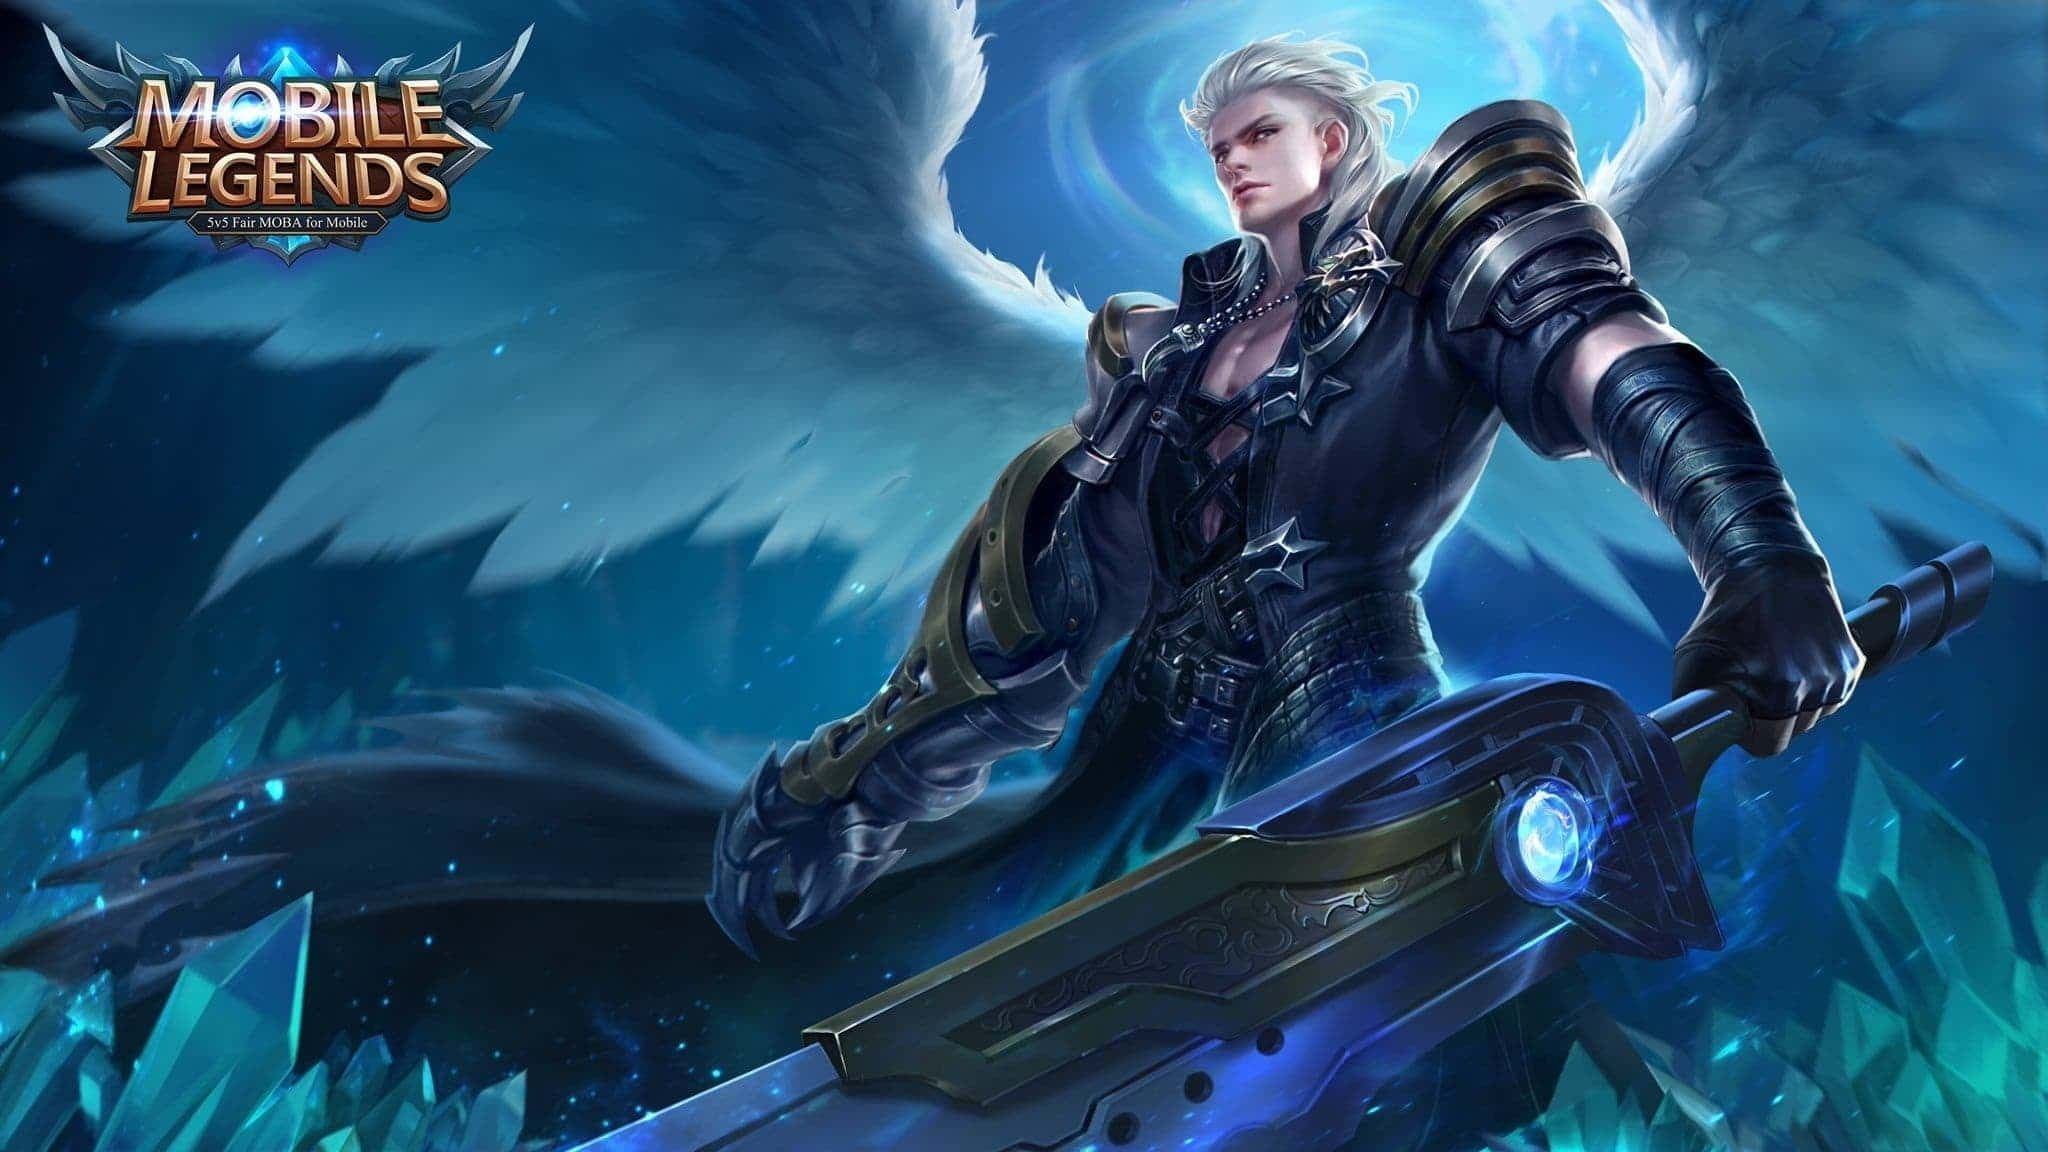 Alucard Alucard Wings Angel Game Man Mobile Legends Fantasy White Blue 1080p Wallpaper Hdwallpaper Deskt Gambar Desain Karakter Game Orang Animasi Hd 1080p mobile legend hd wallpaper